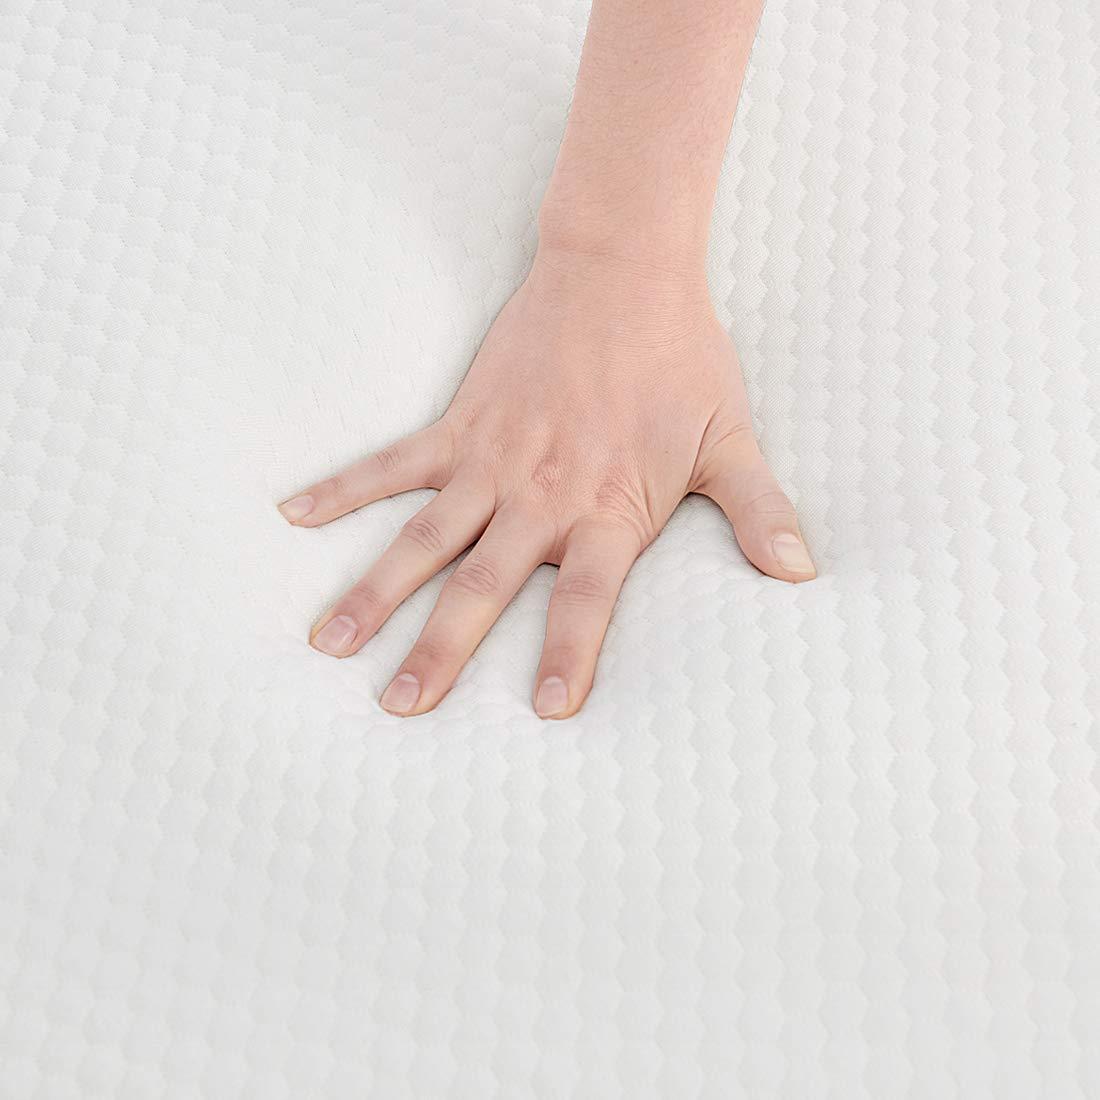 Queen Mattress, Ssecretland 10 inch Gel Memory Foam Mattress with CertiPUR-US Certified Foam, Firm Feels | Bed Mattress in a Box, [Mattress Only] 10-Year Warranty - Queen Size by Ssecretland (Image #7)